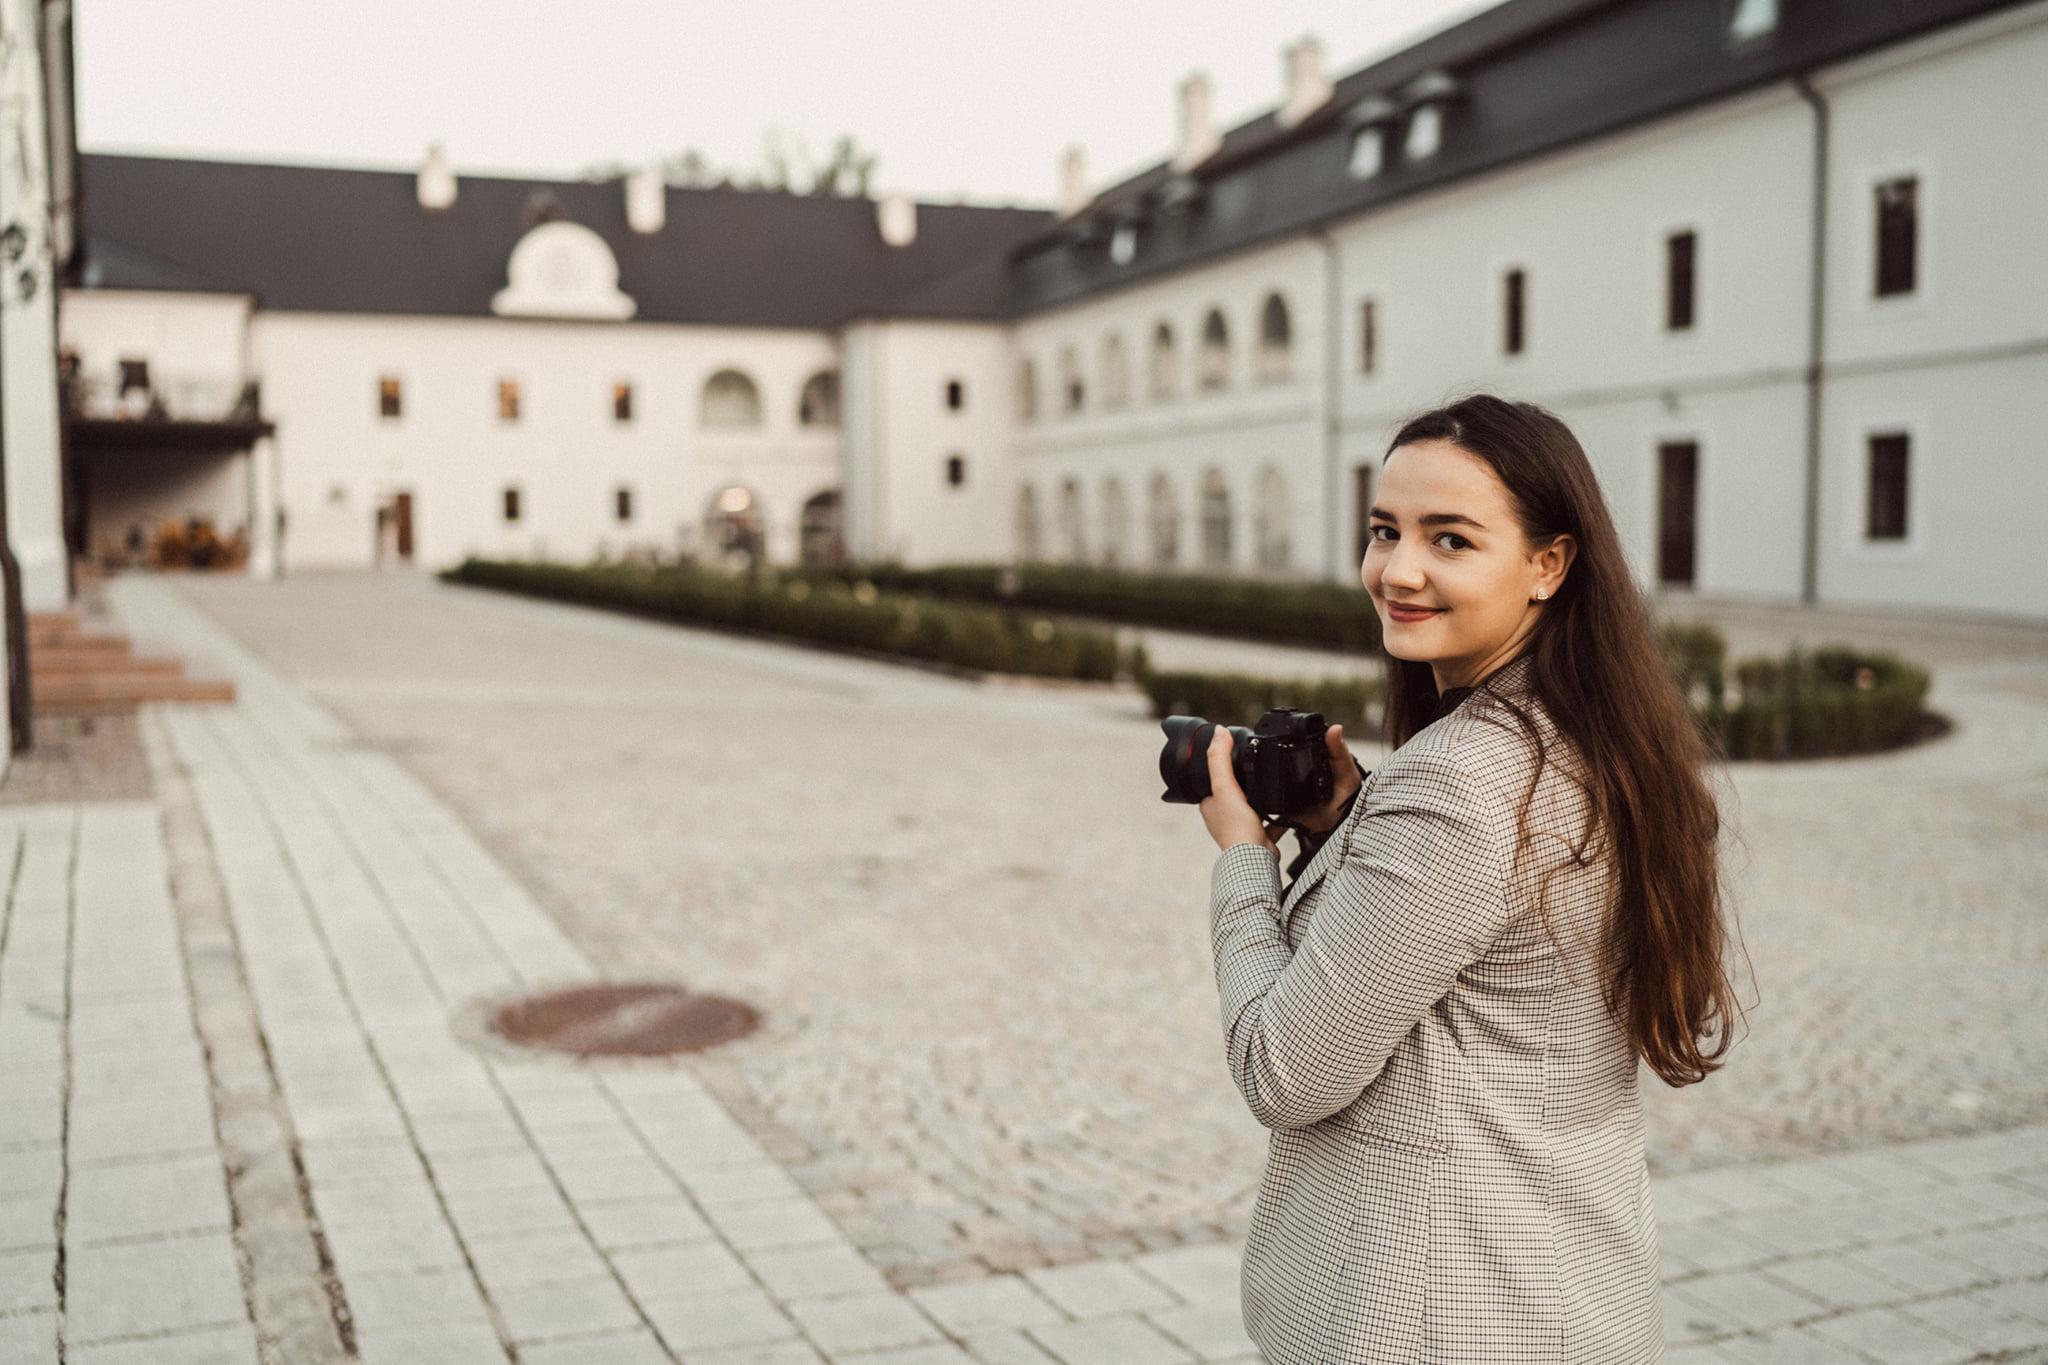 fotograf-svadba-kamera-appony-oponicejpg